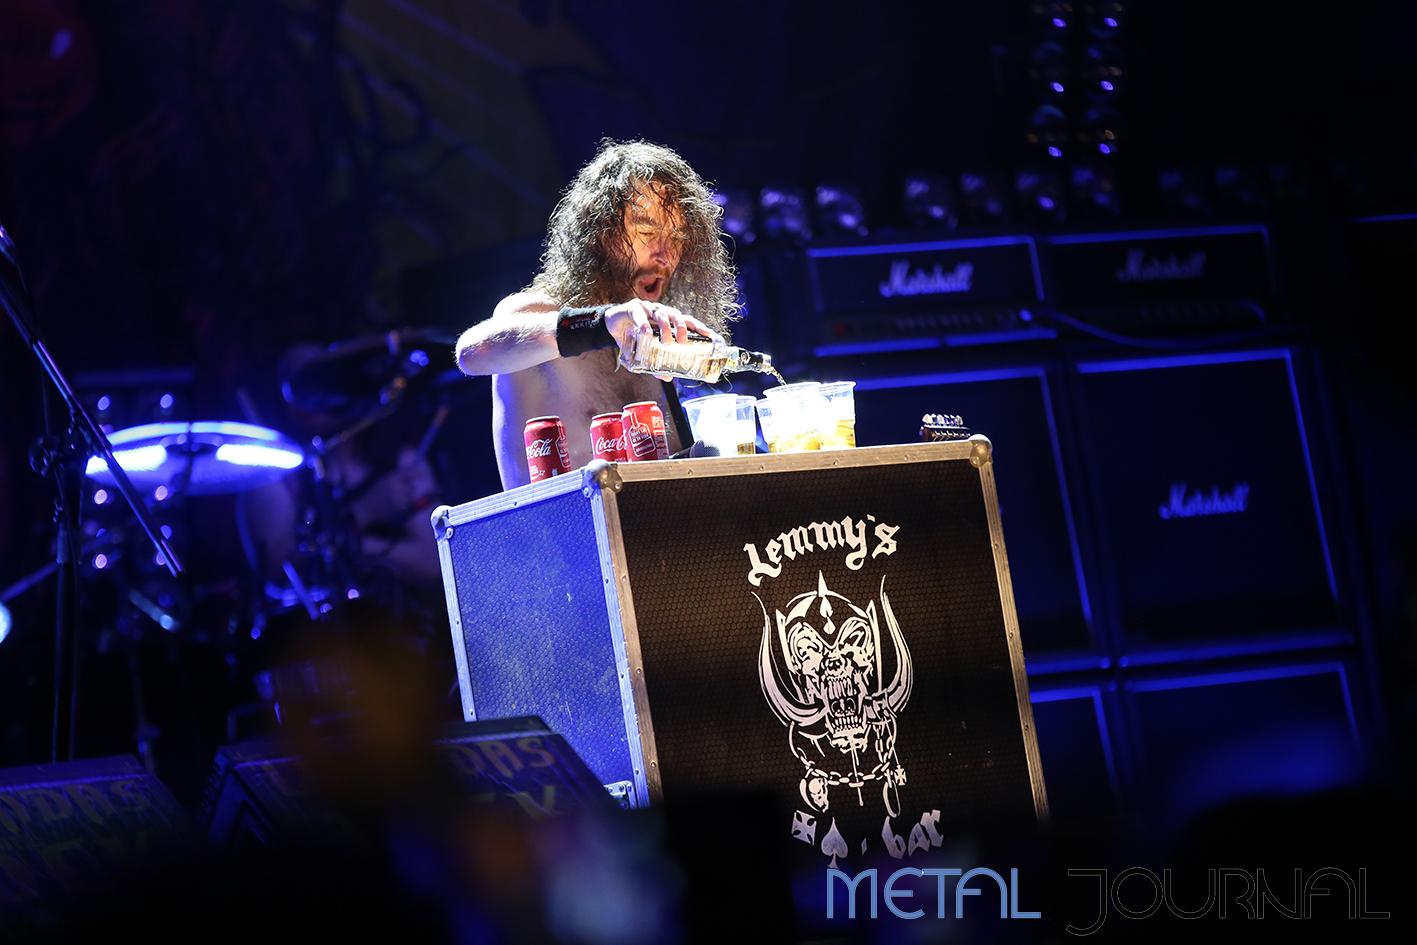 airbourne - leyendas del rock 2019 metal journal pic 9